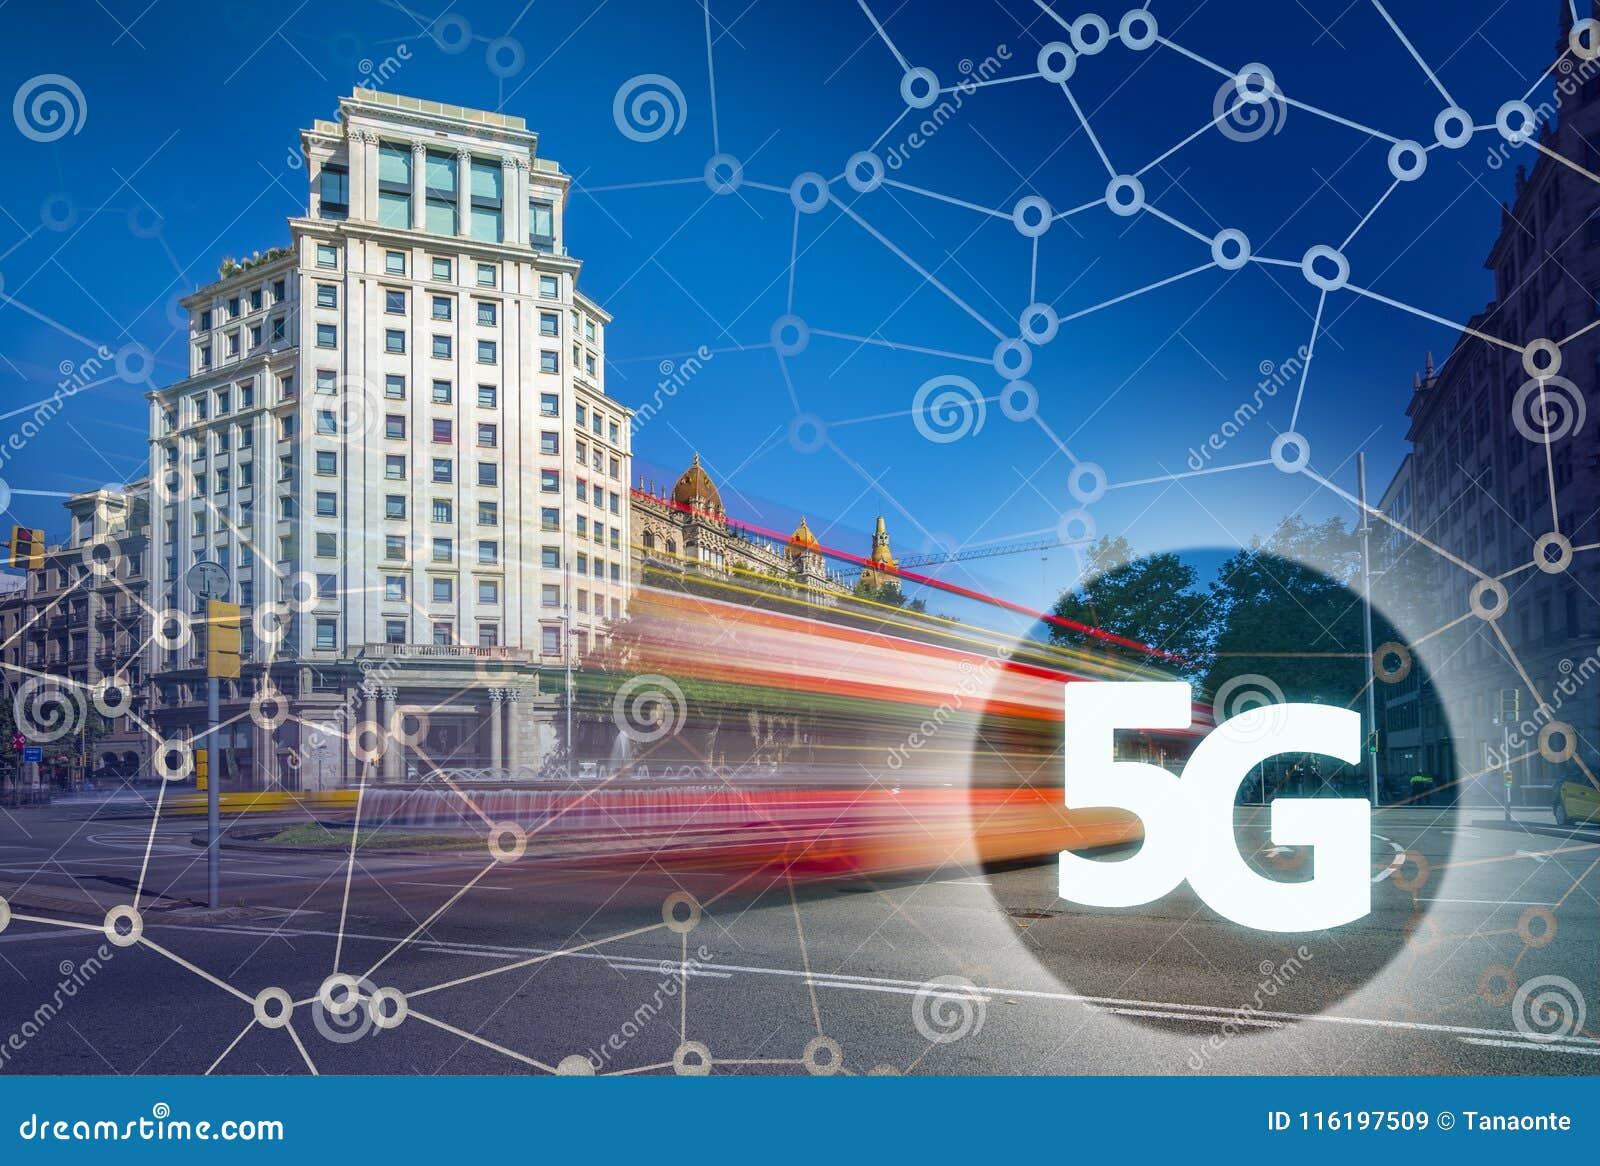 5G Or LTE Presentation  Barcelona Modern City On The